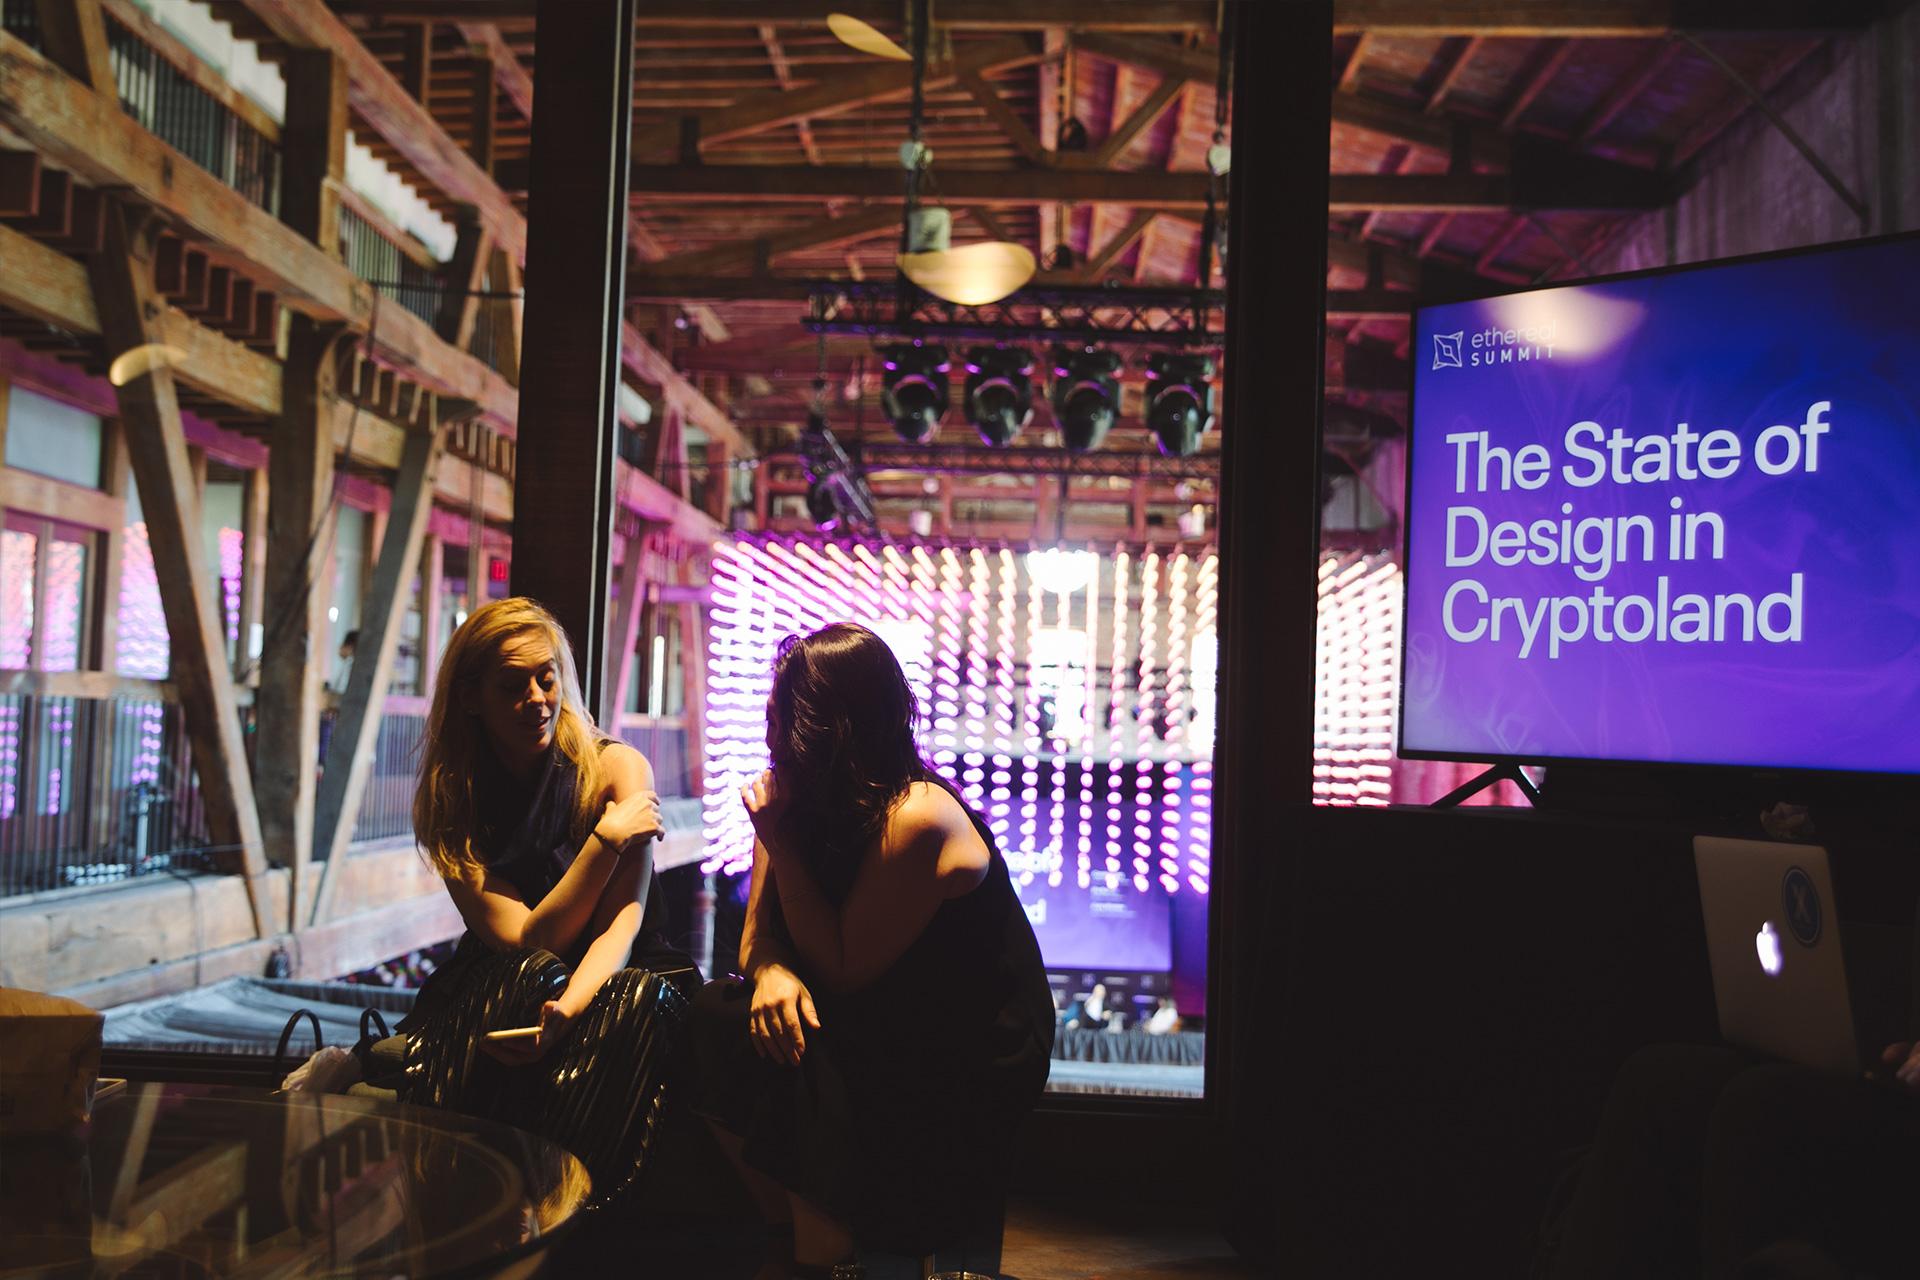 ethereal-summit-photos-new-york-2019-state-of-design-cryptoland.jpg